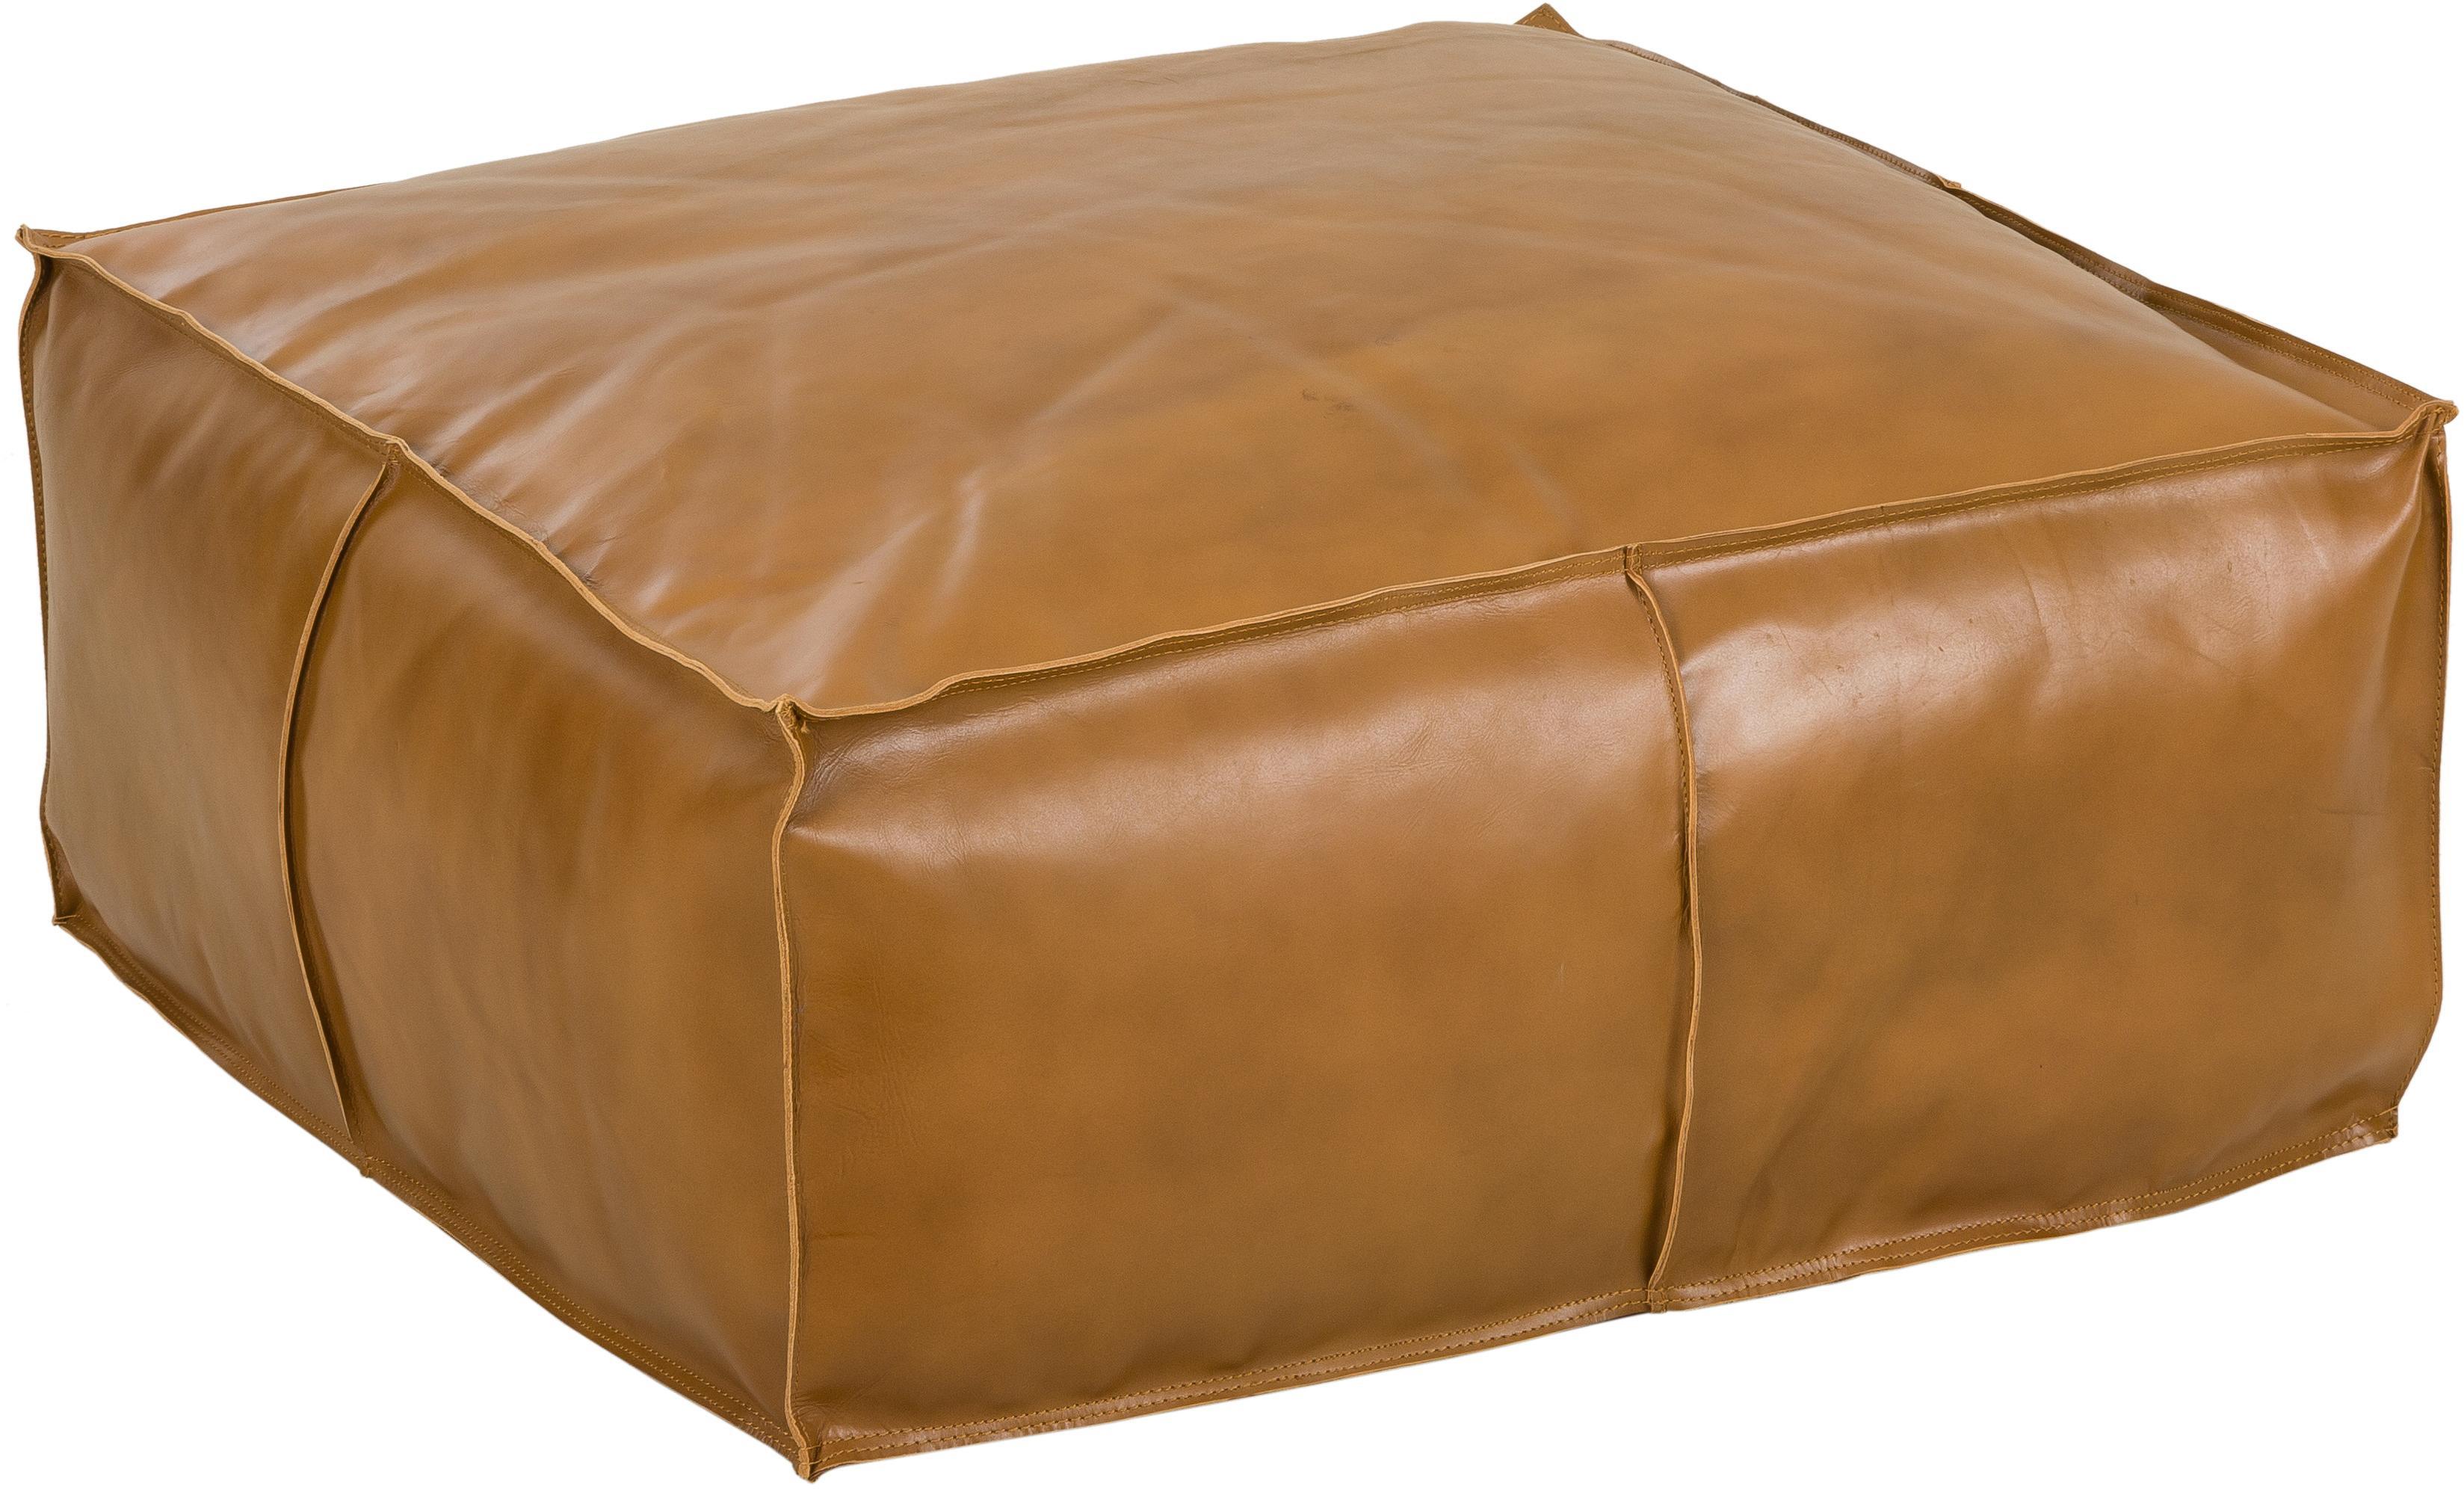 Großer Leder-Pouf Arabica, Bezug: Leder Unterseite, Cognac, 70 x 30 cm